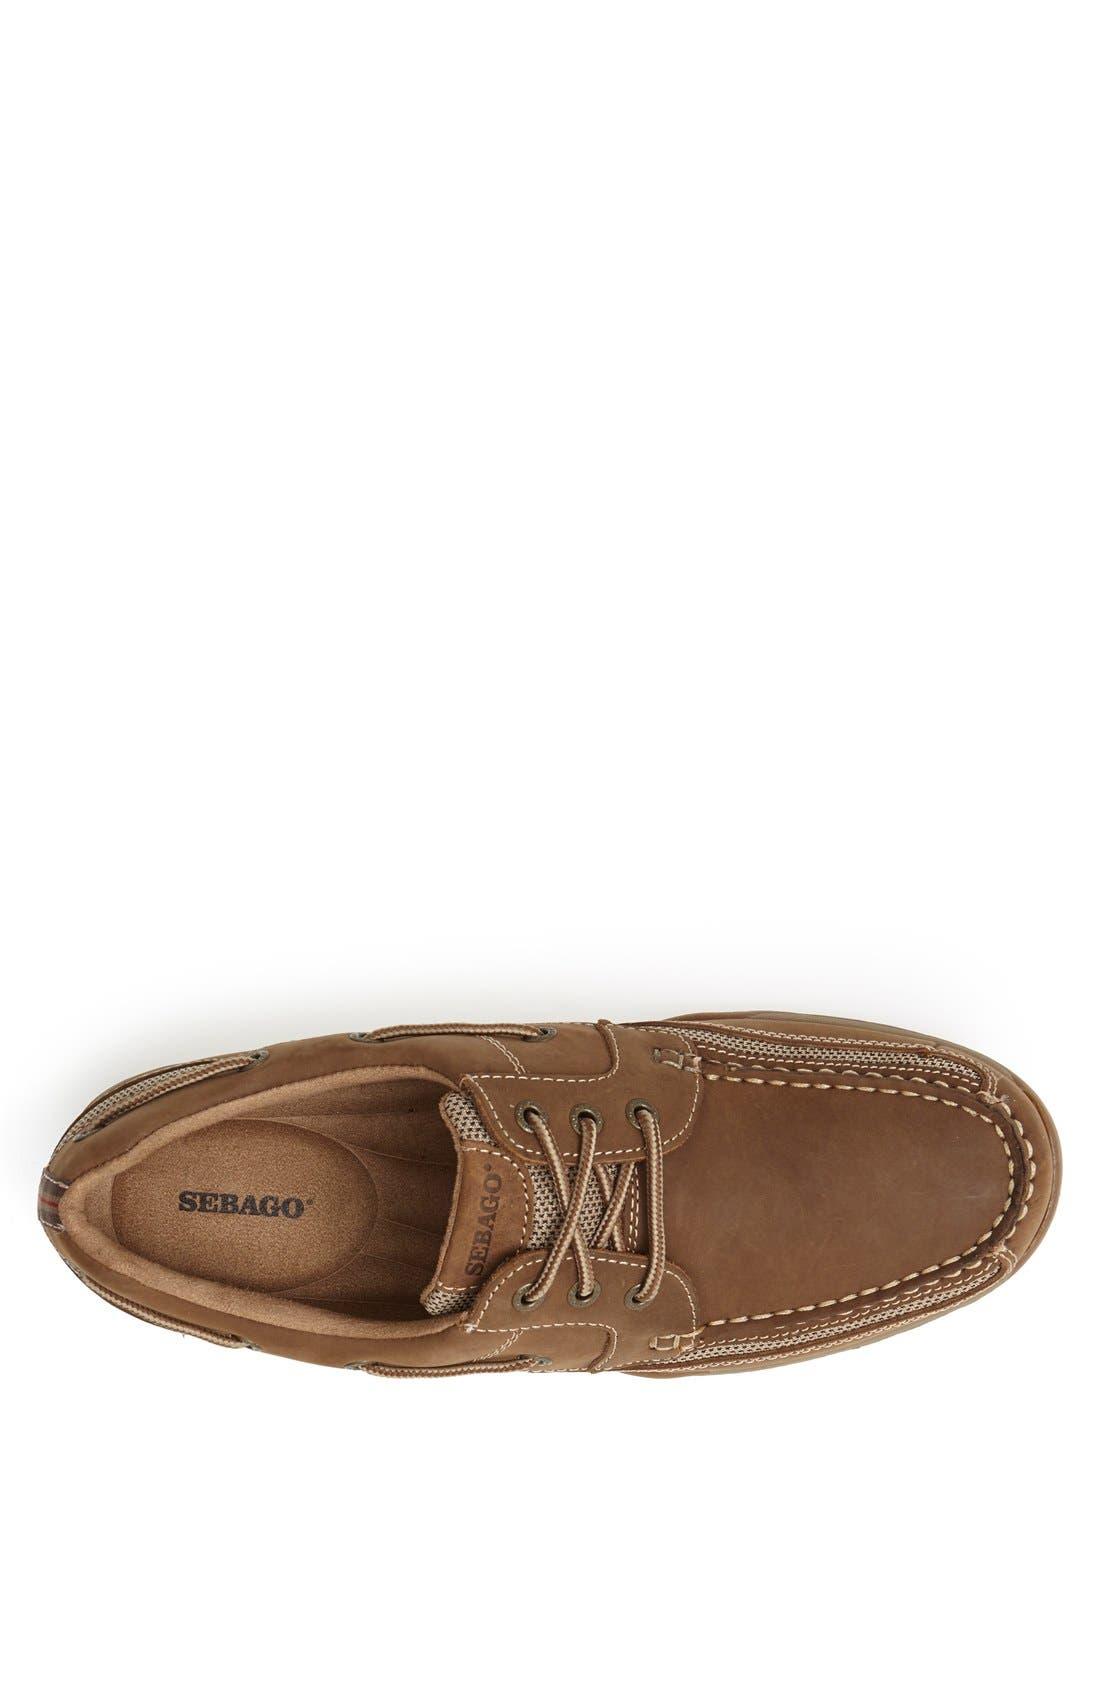 Alternate Image 3  - Sebago 'Carrick' Boat Shoe